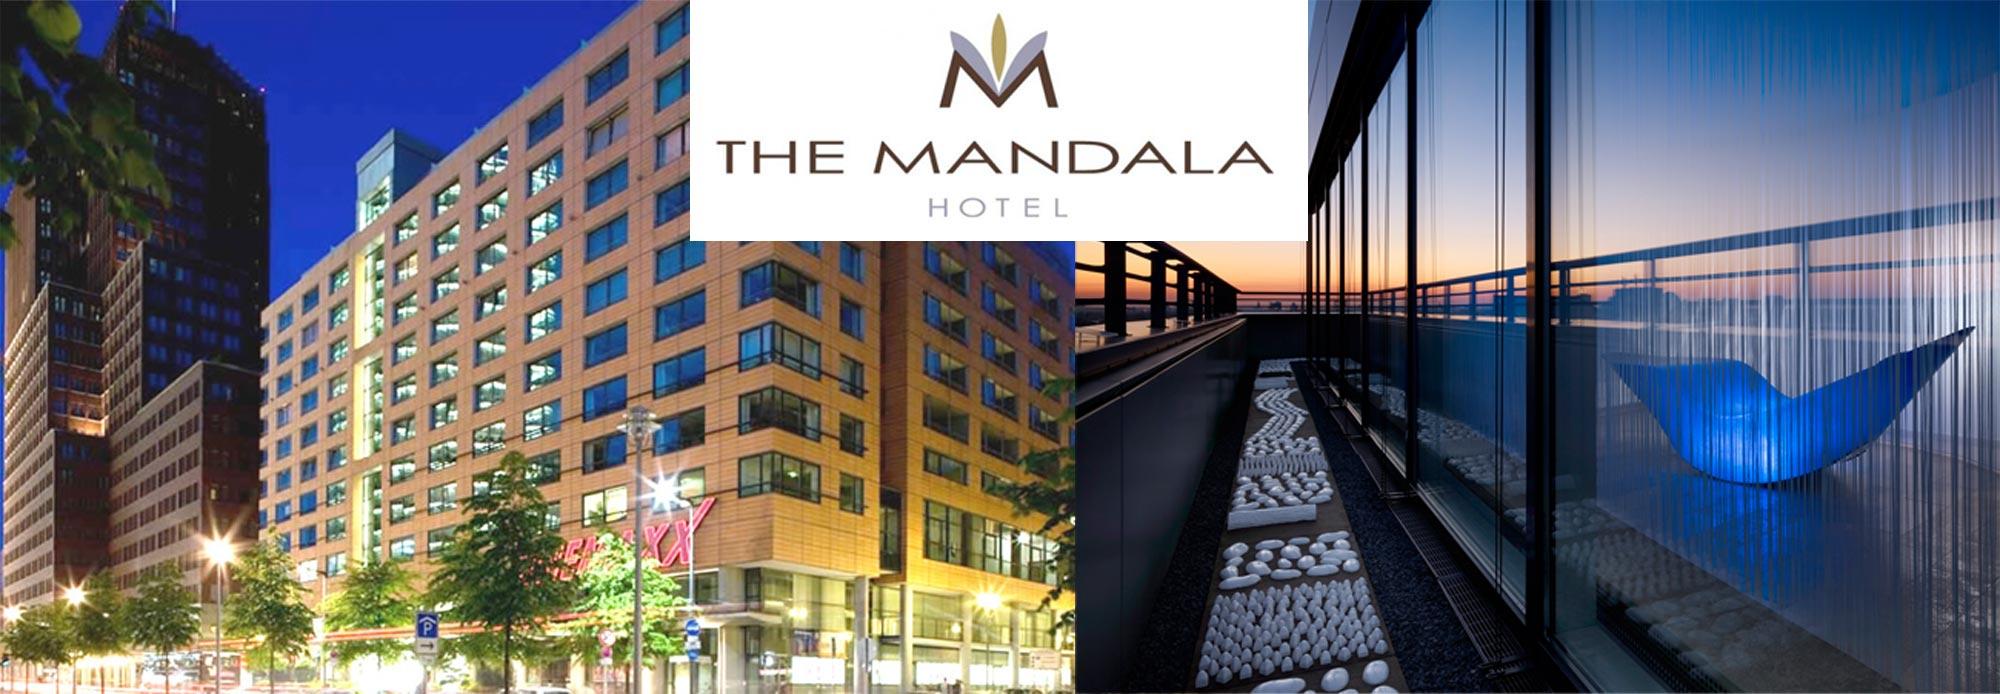 probeschlafen hotel mandala schramm boxspringbetten in. Black Bedroom Furniture Sets. Home Design Ideas